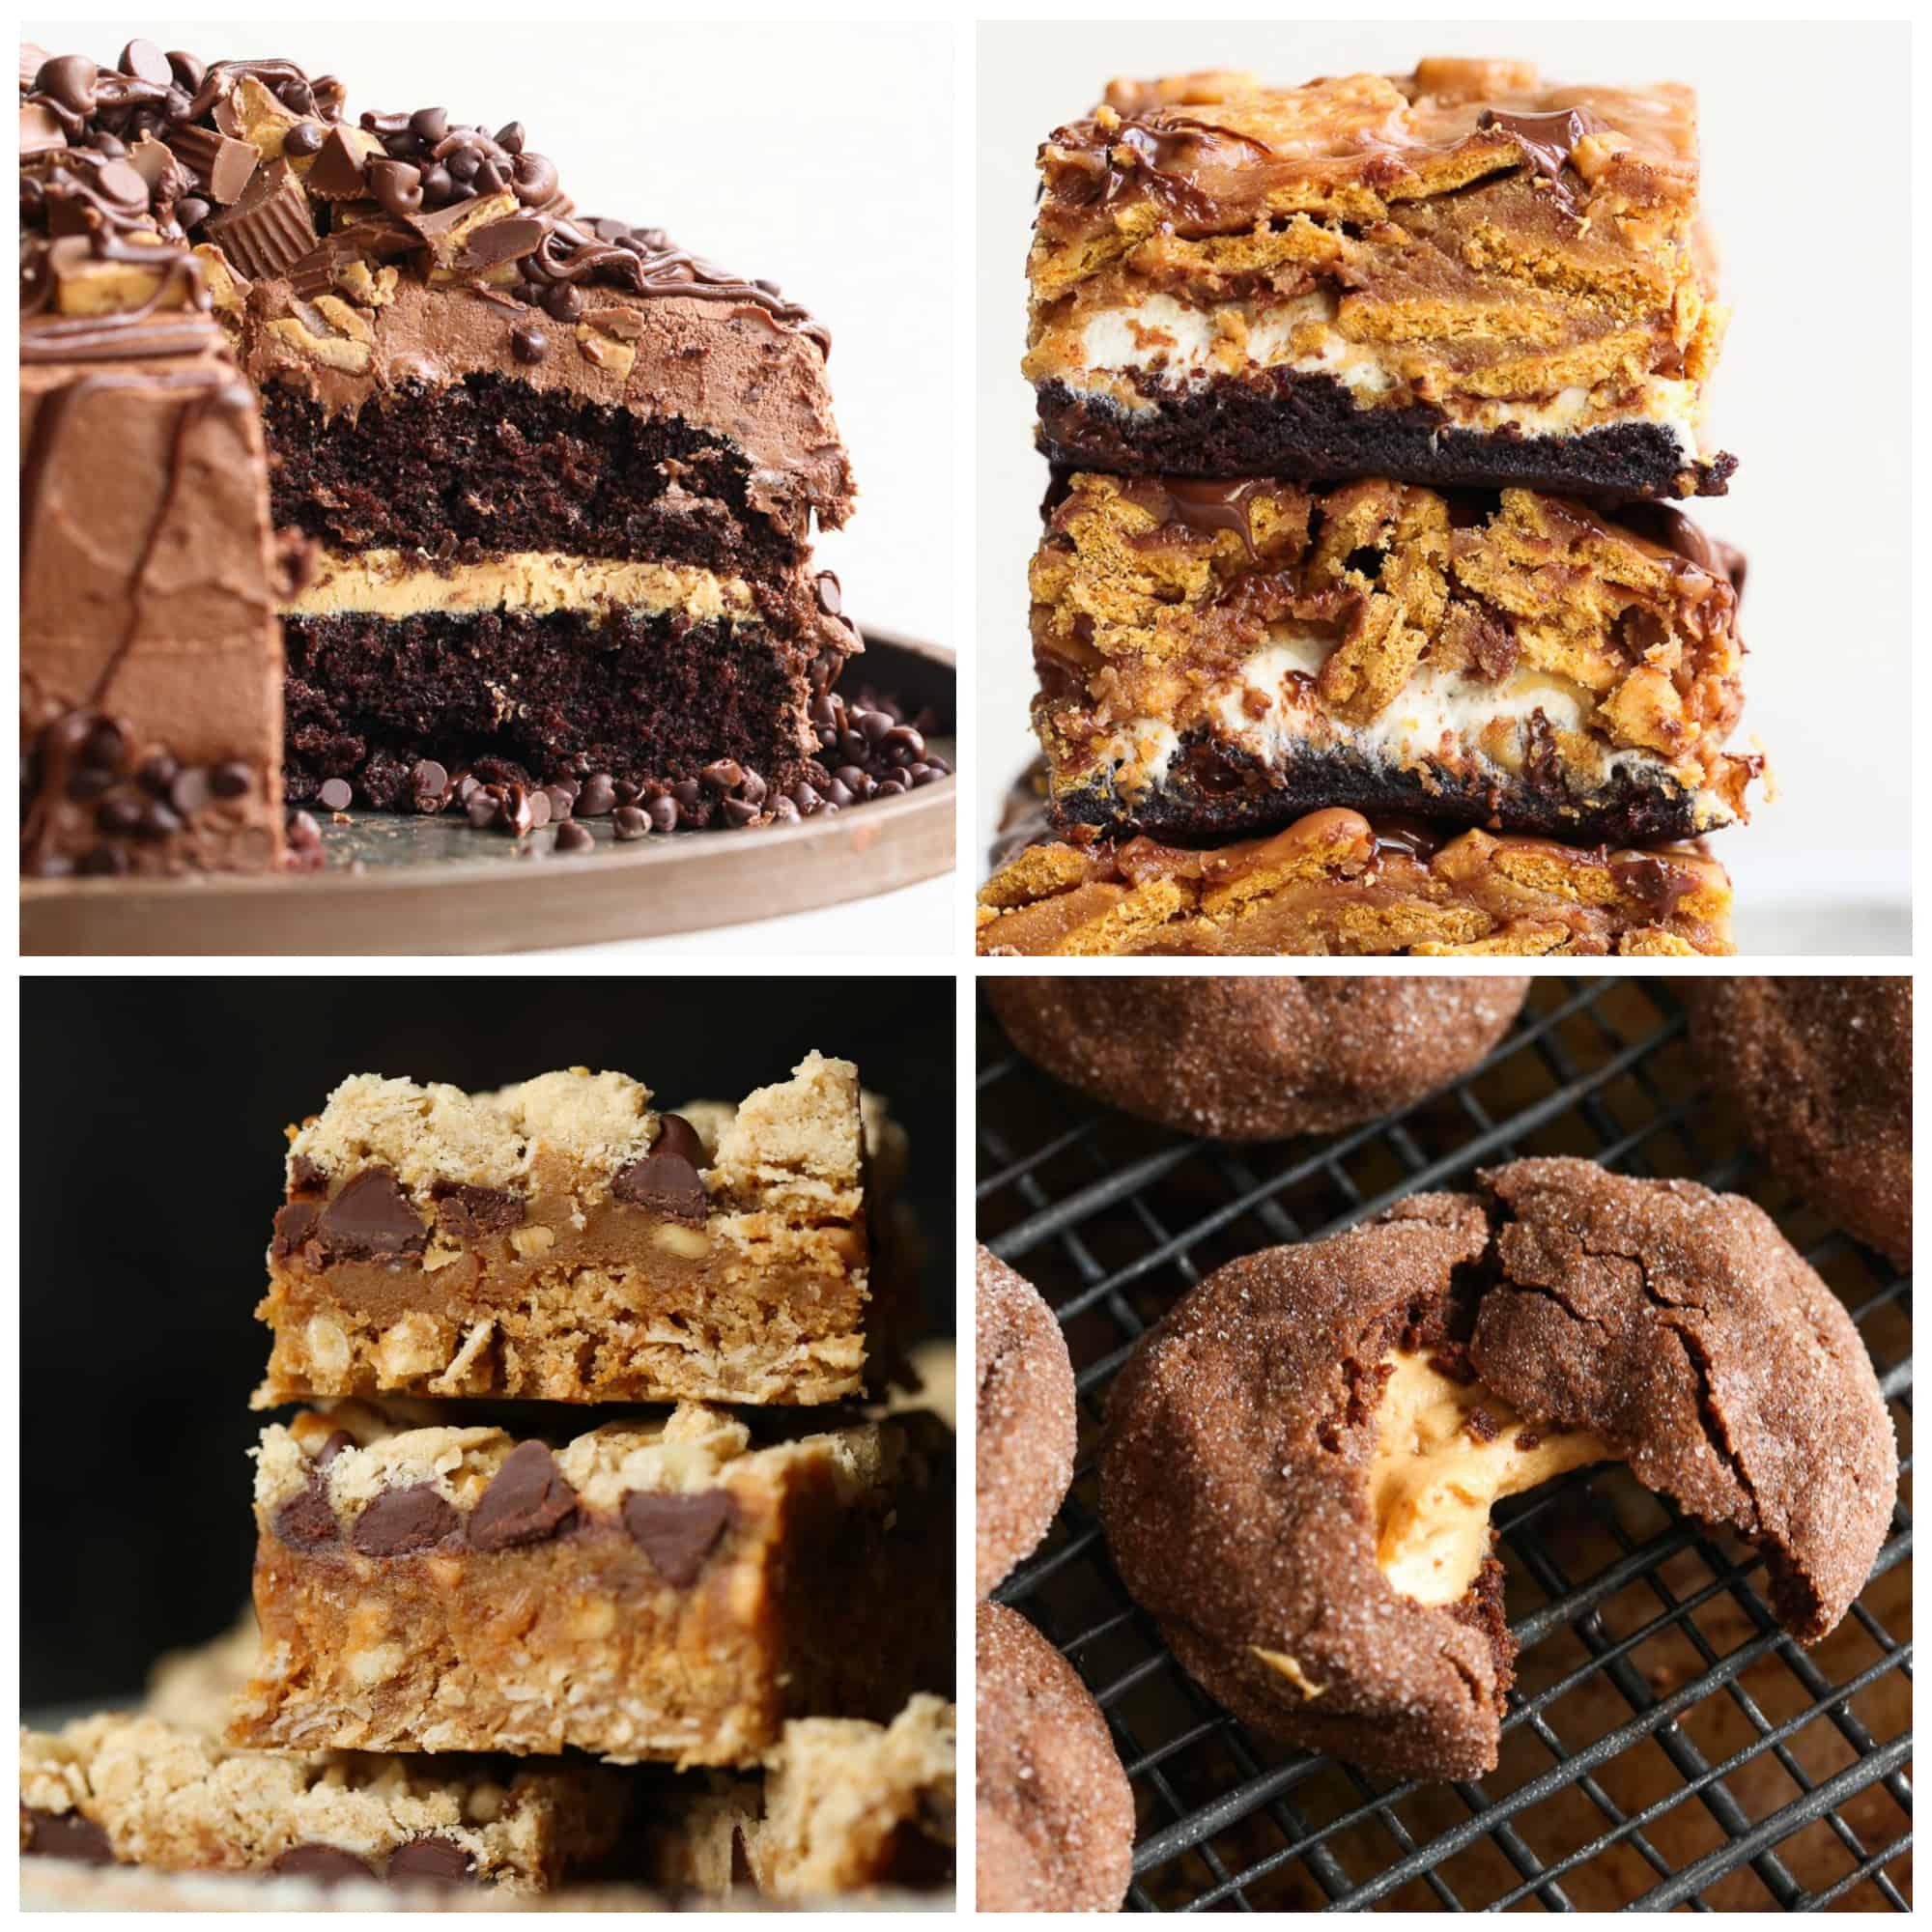 20 Amazing Peanut Butter Dessert Recipes